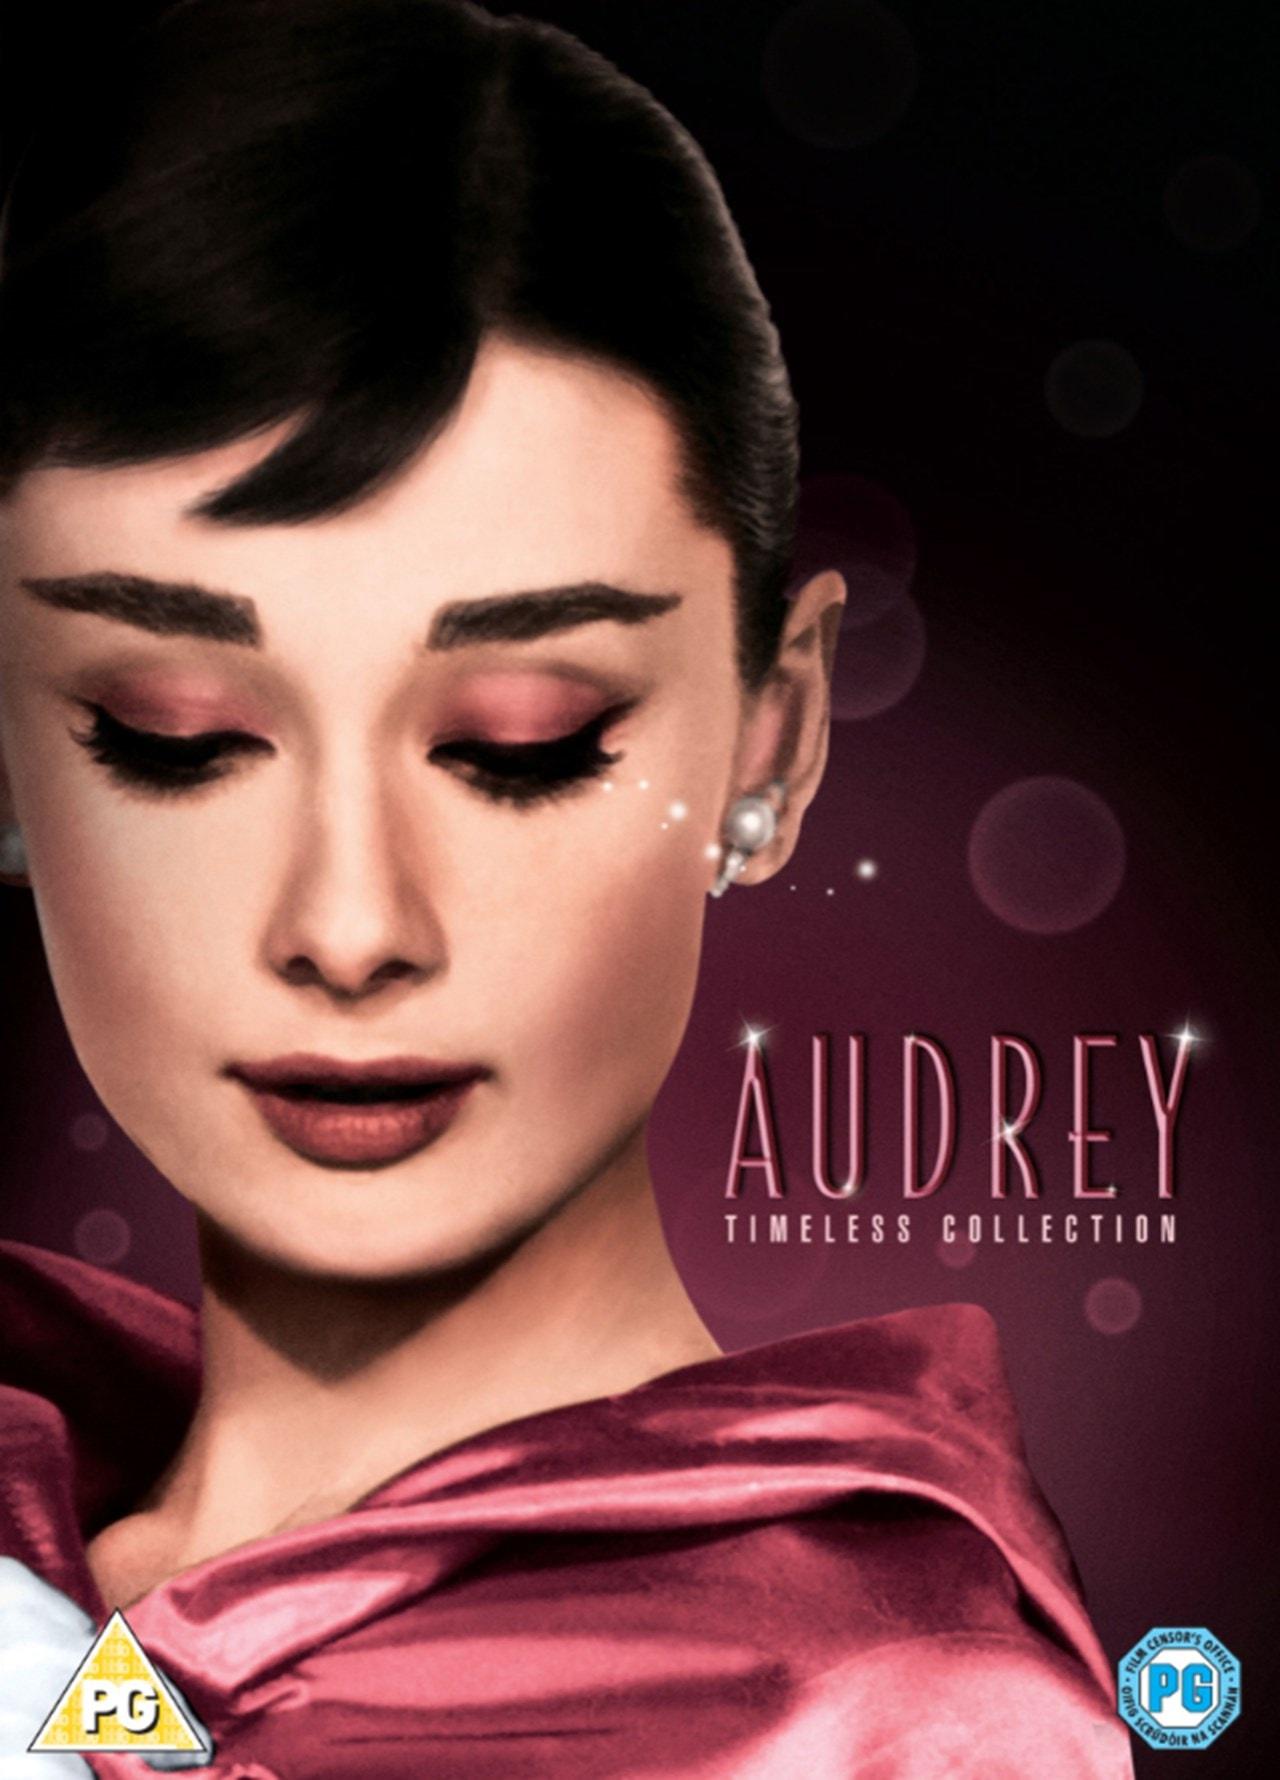 Audrey Hepburn Timeless Collection - 1